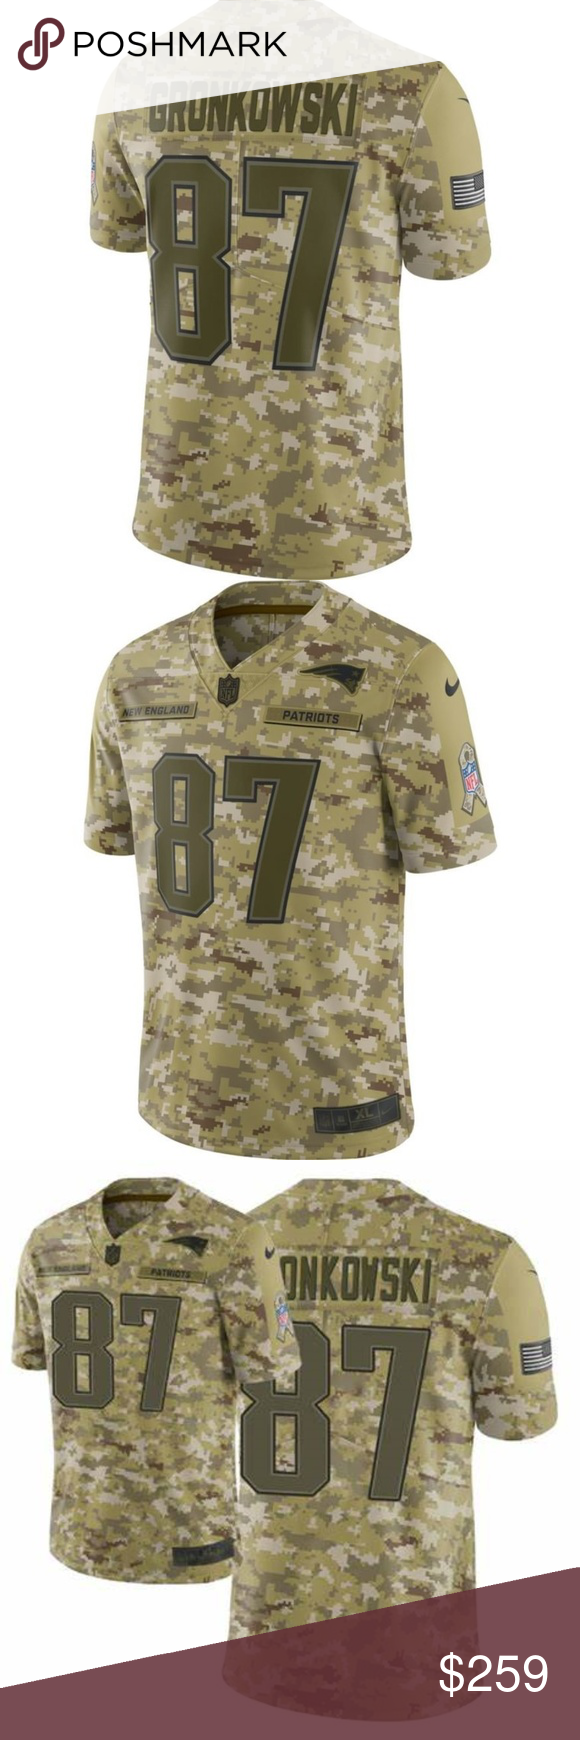 rob gronkowski military jersey